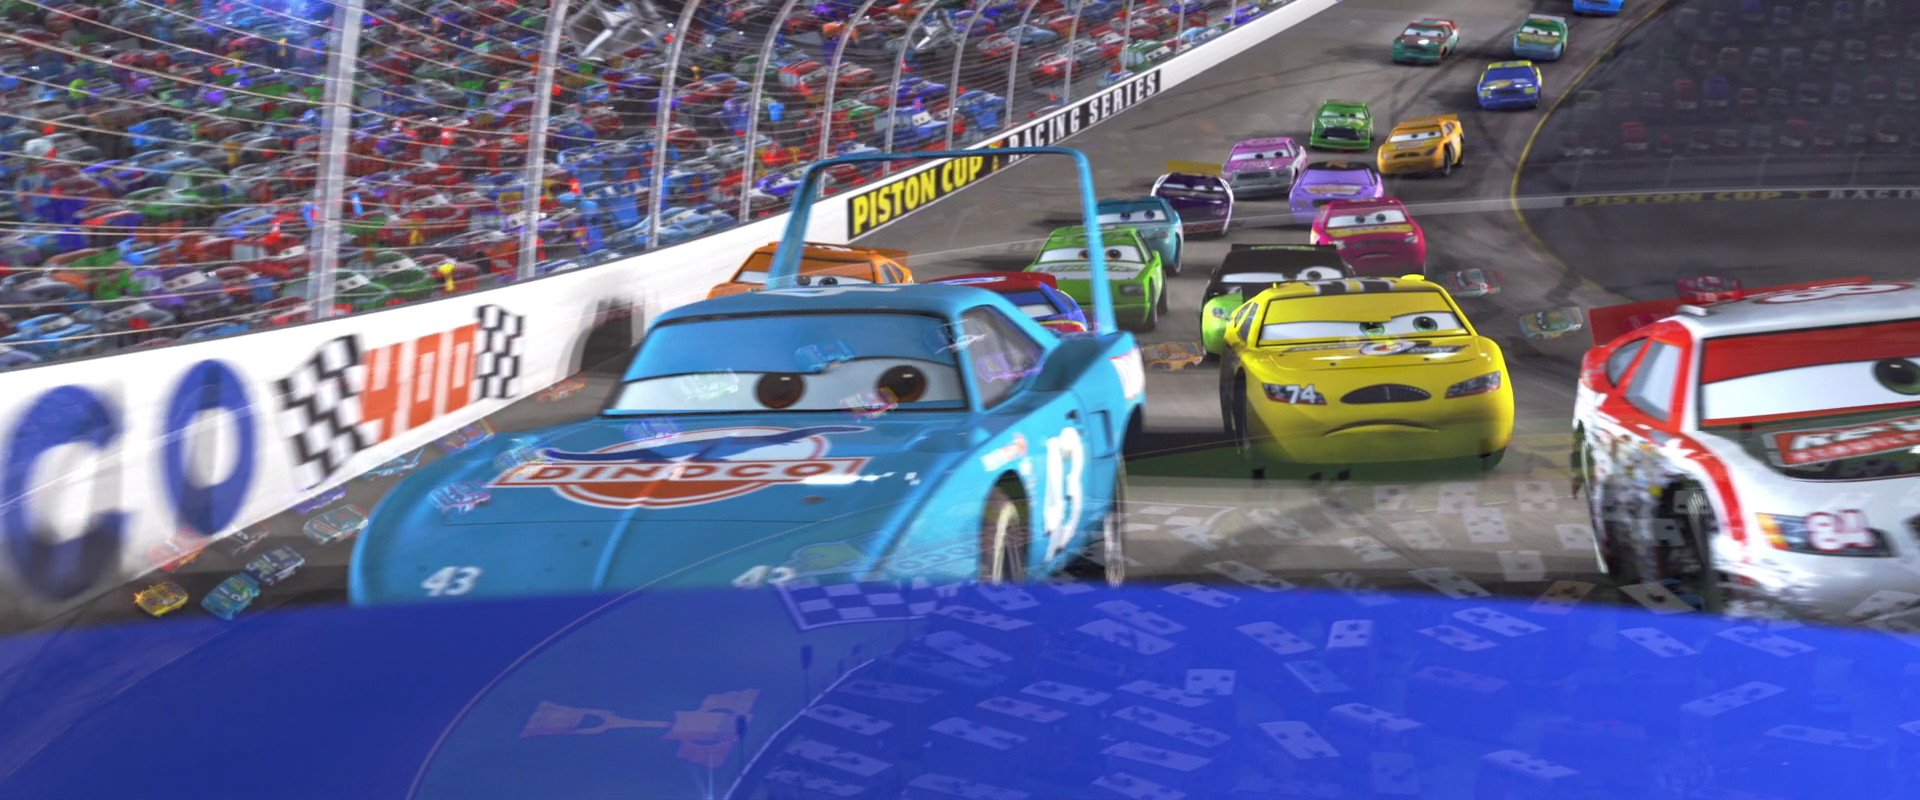 Ryan Shields World Of Cars Wiki Fandom